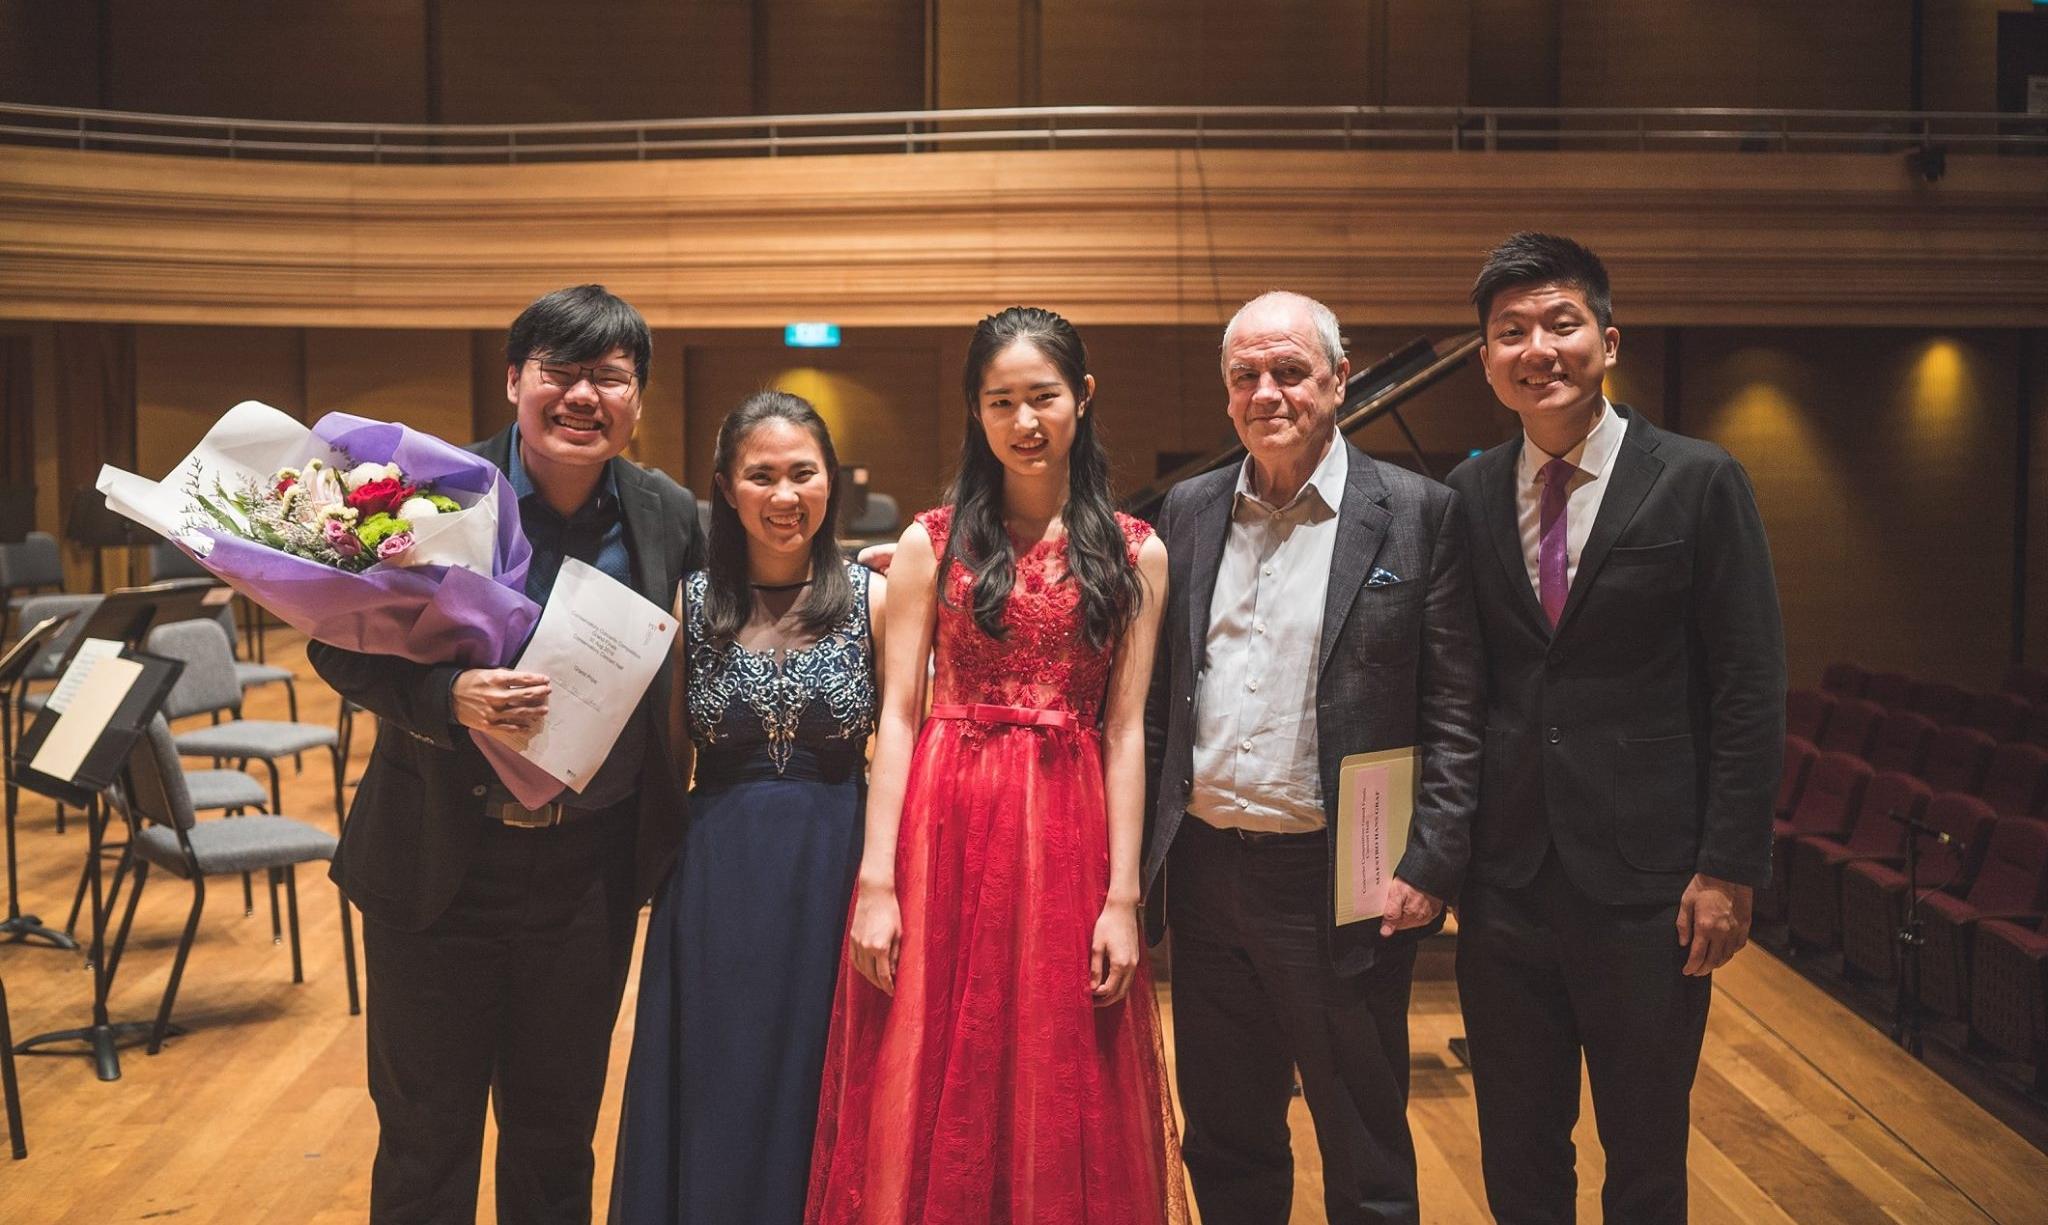 From left: Tzu Kuang, Shayna, Yuqi, Maestro Hans Graf, and Jian Han